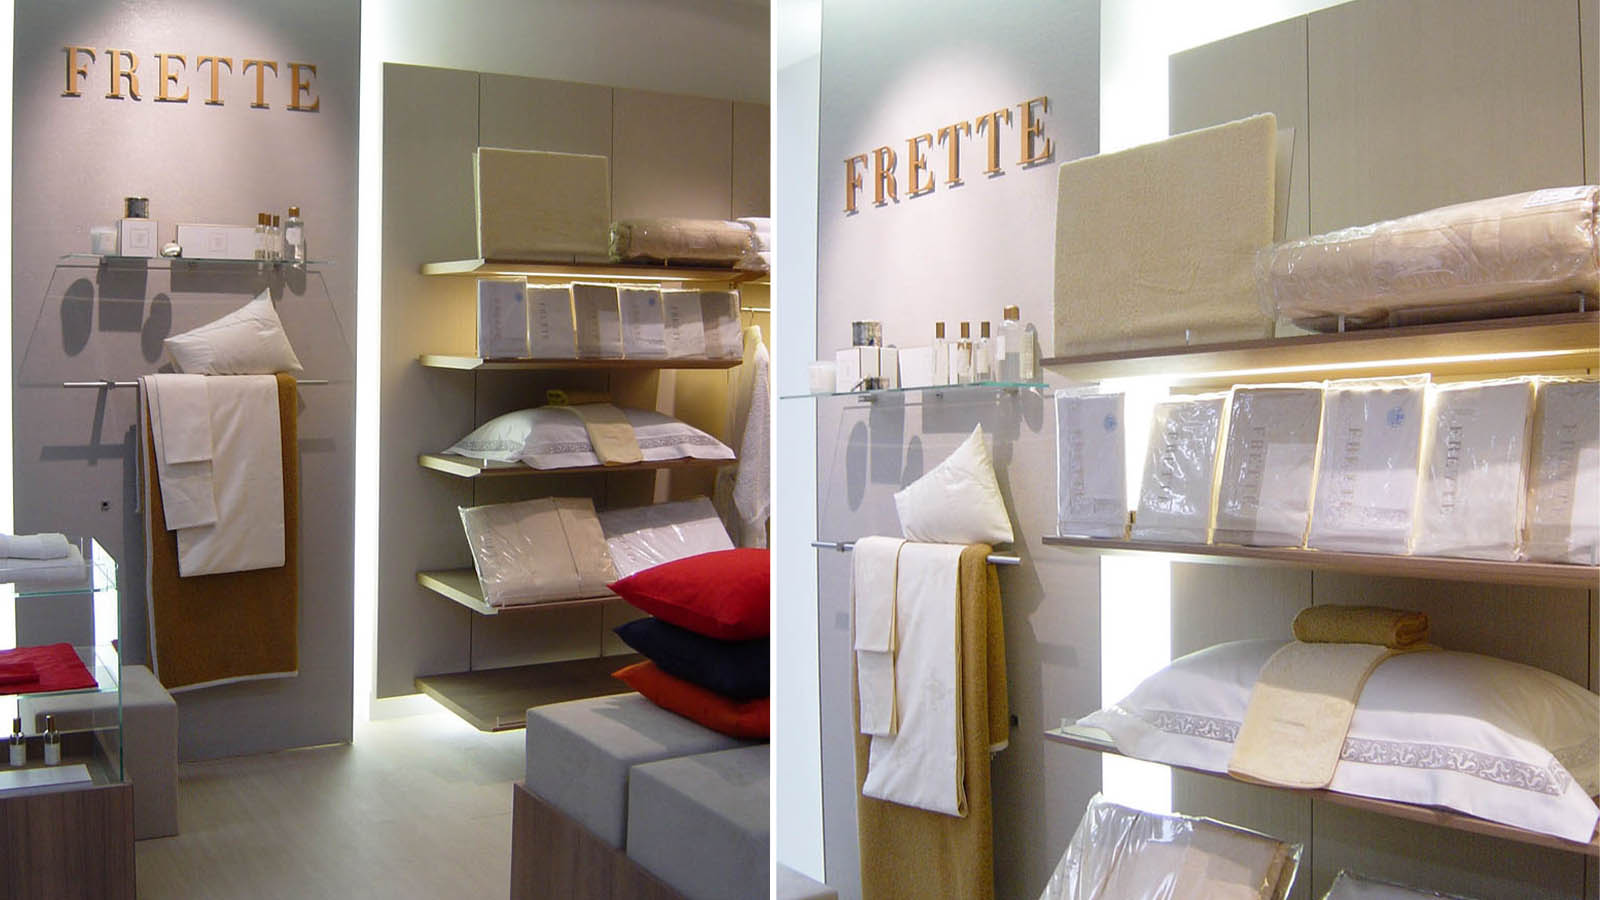 frette-showroom-zona-bagno